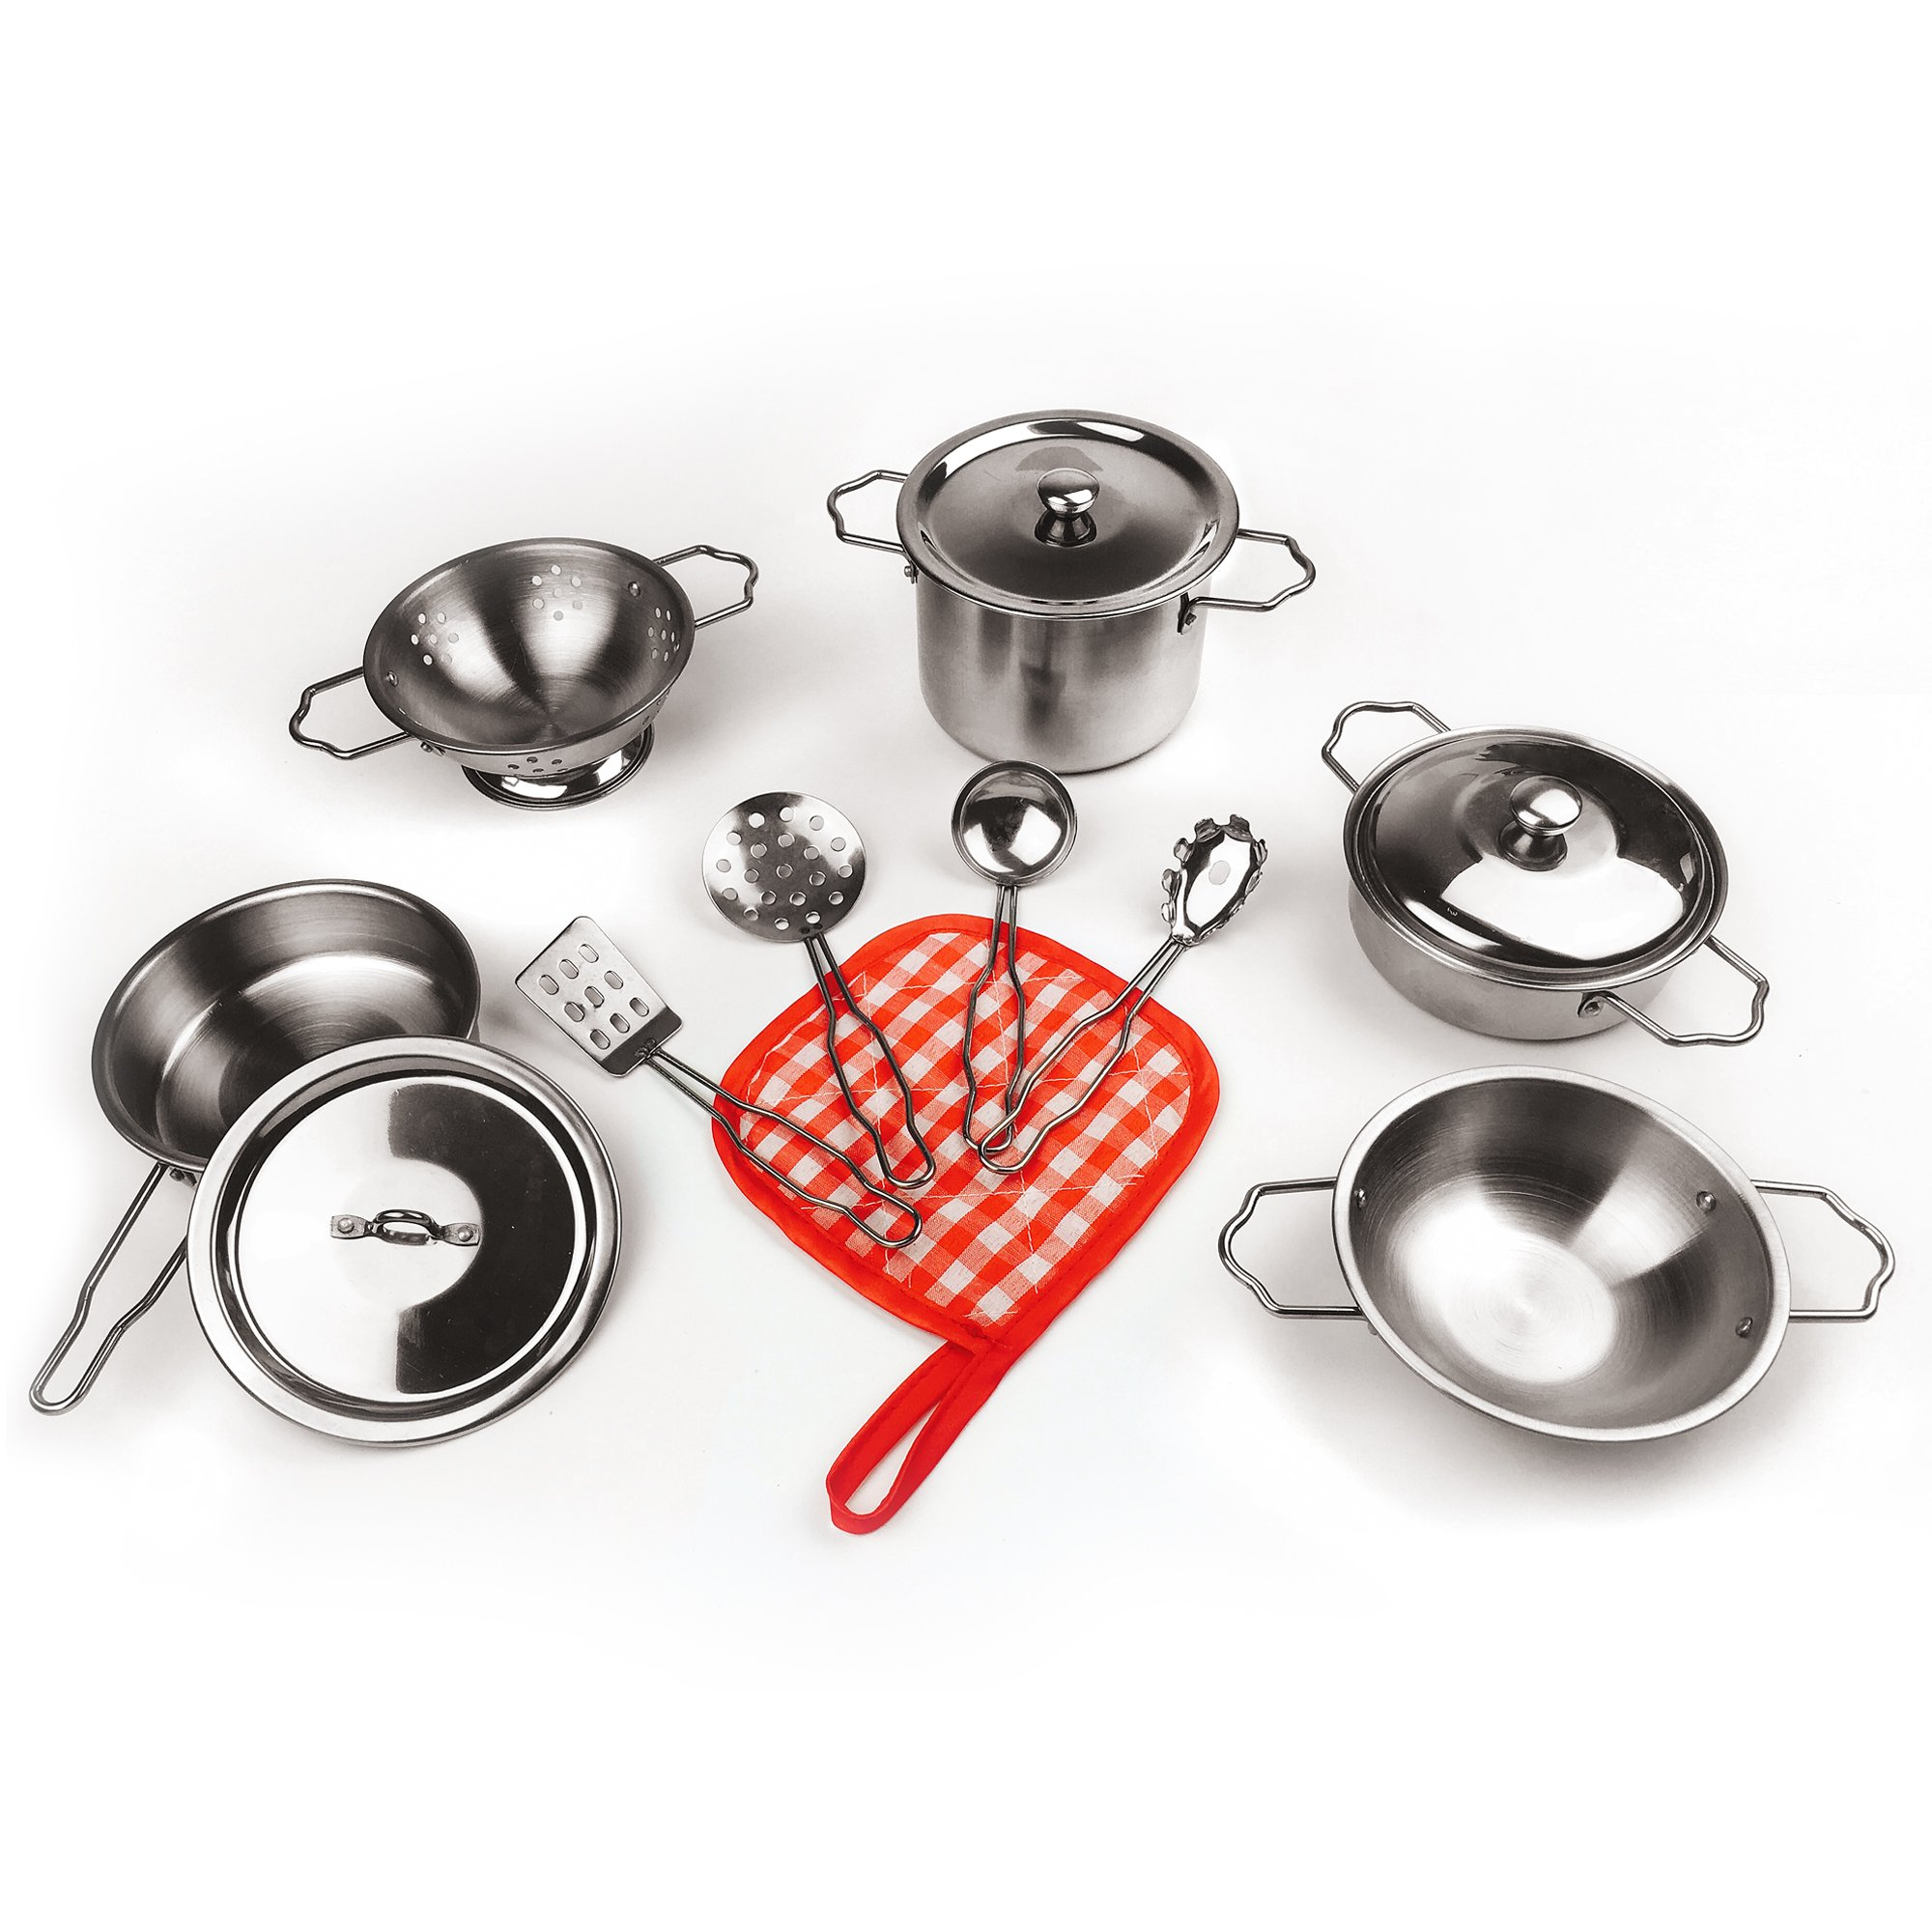 KIDAMI Stainless Cookware Varieties Utensils